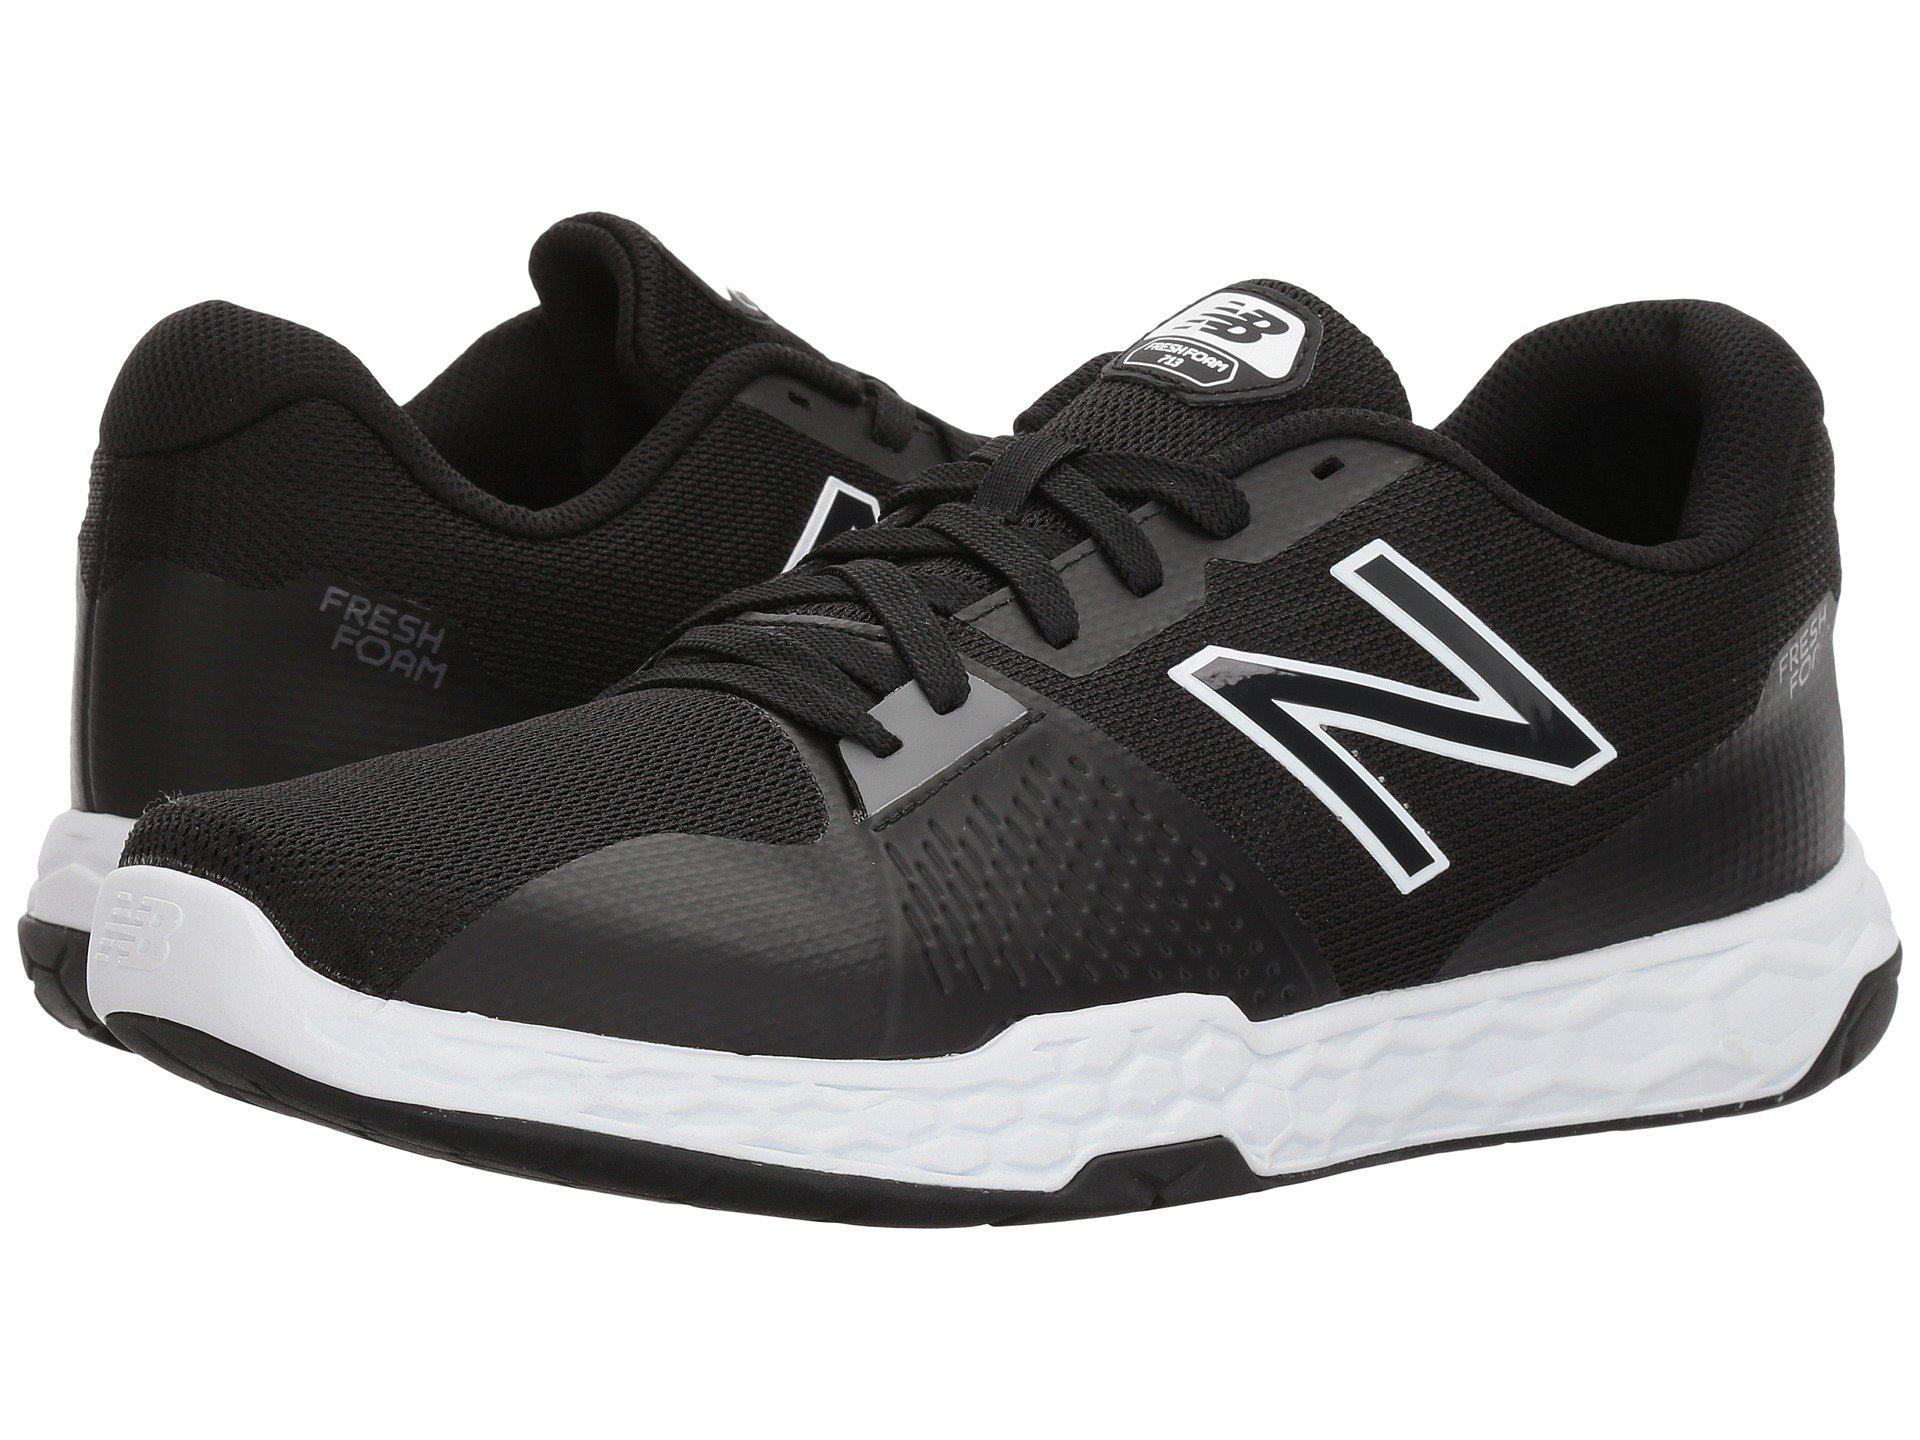 hot sale online 43198 5f1ae Lyst - New Balance Mx713v3 in Black for Men